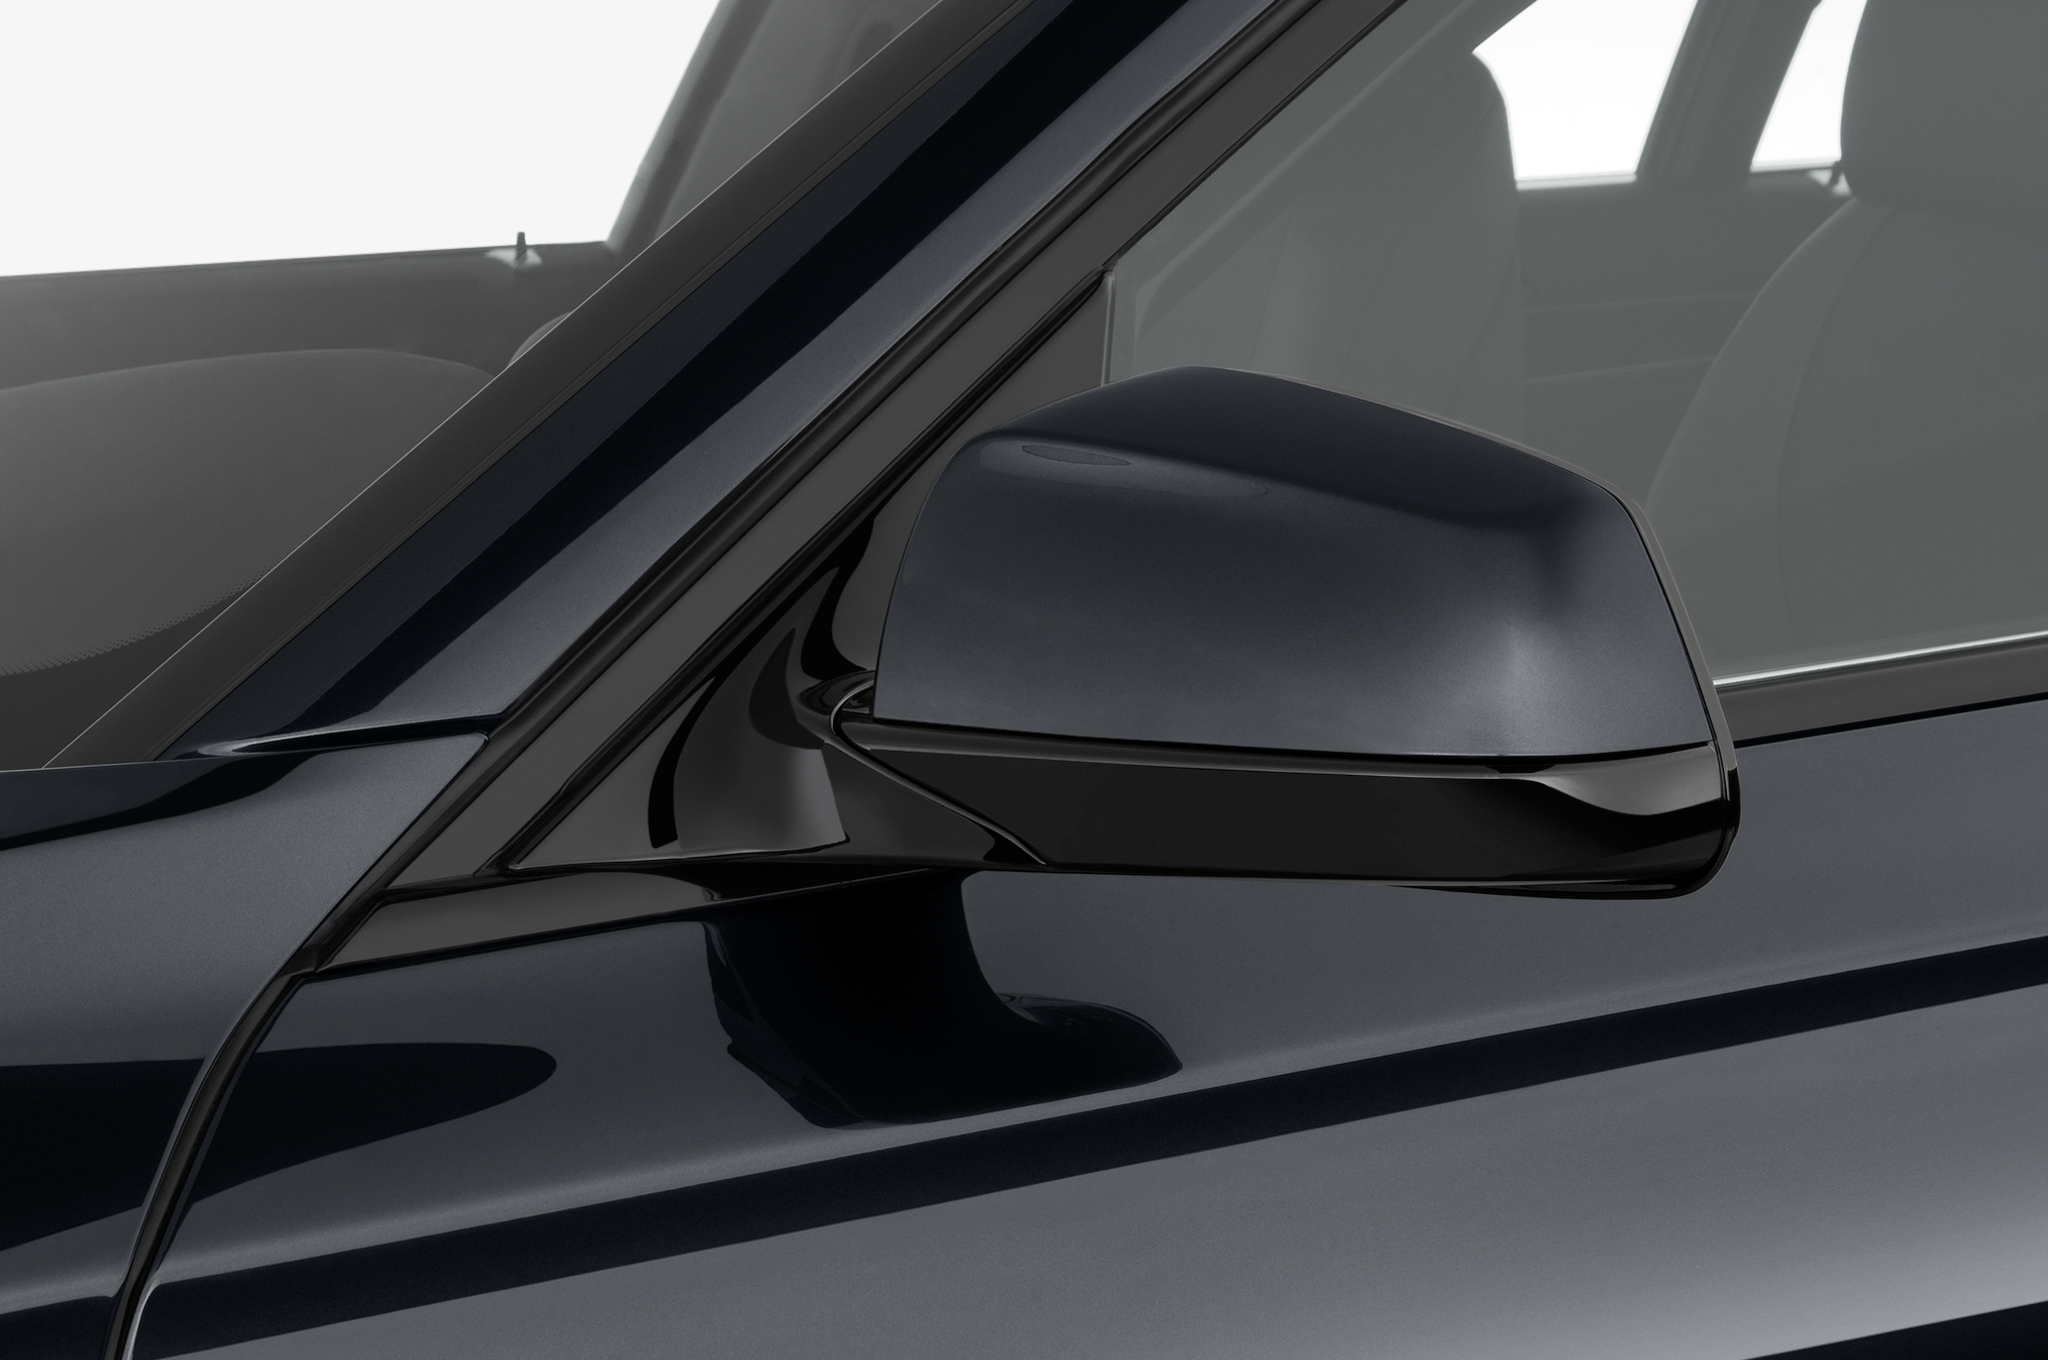 2012 BMW 740i Sedan - Editors\' Notebook - Automobile Magazine